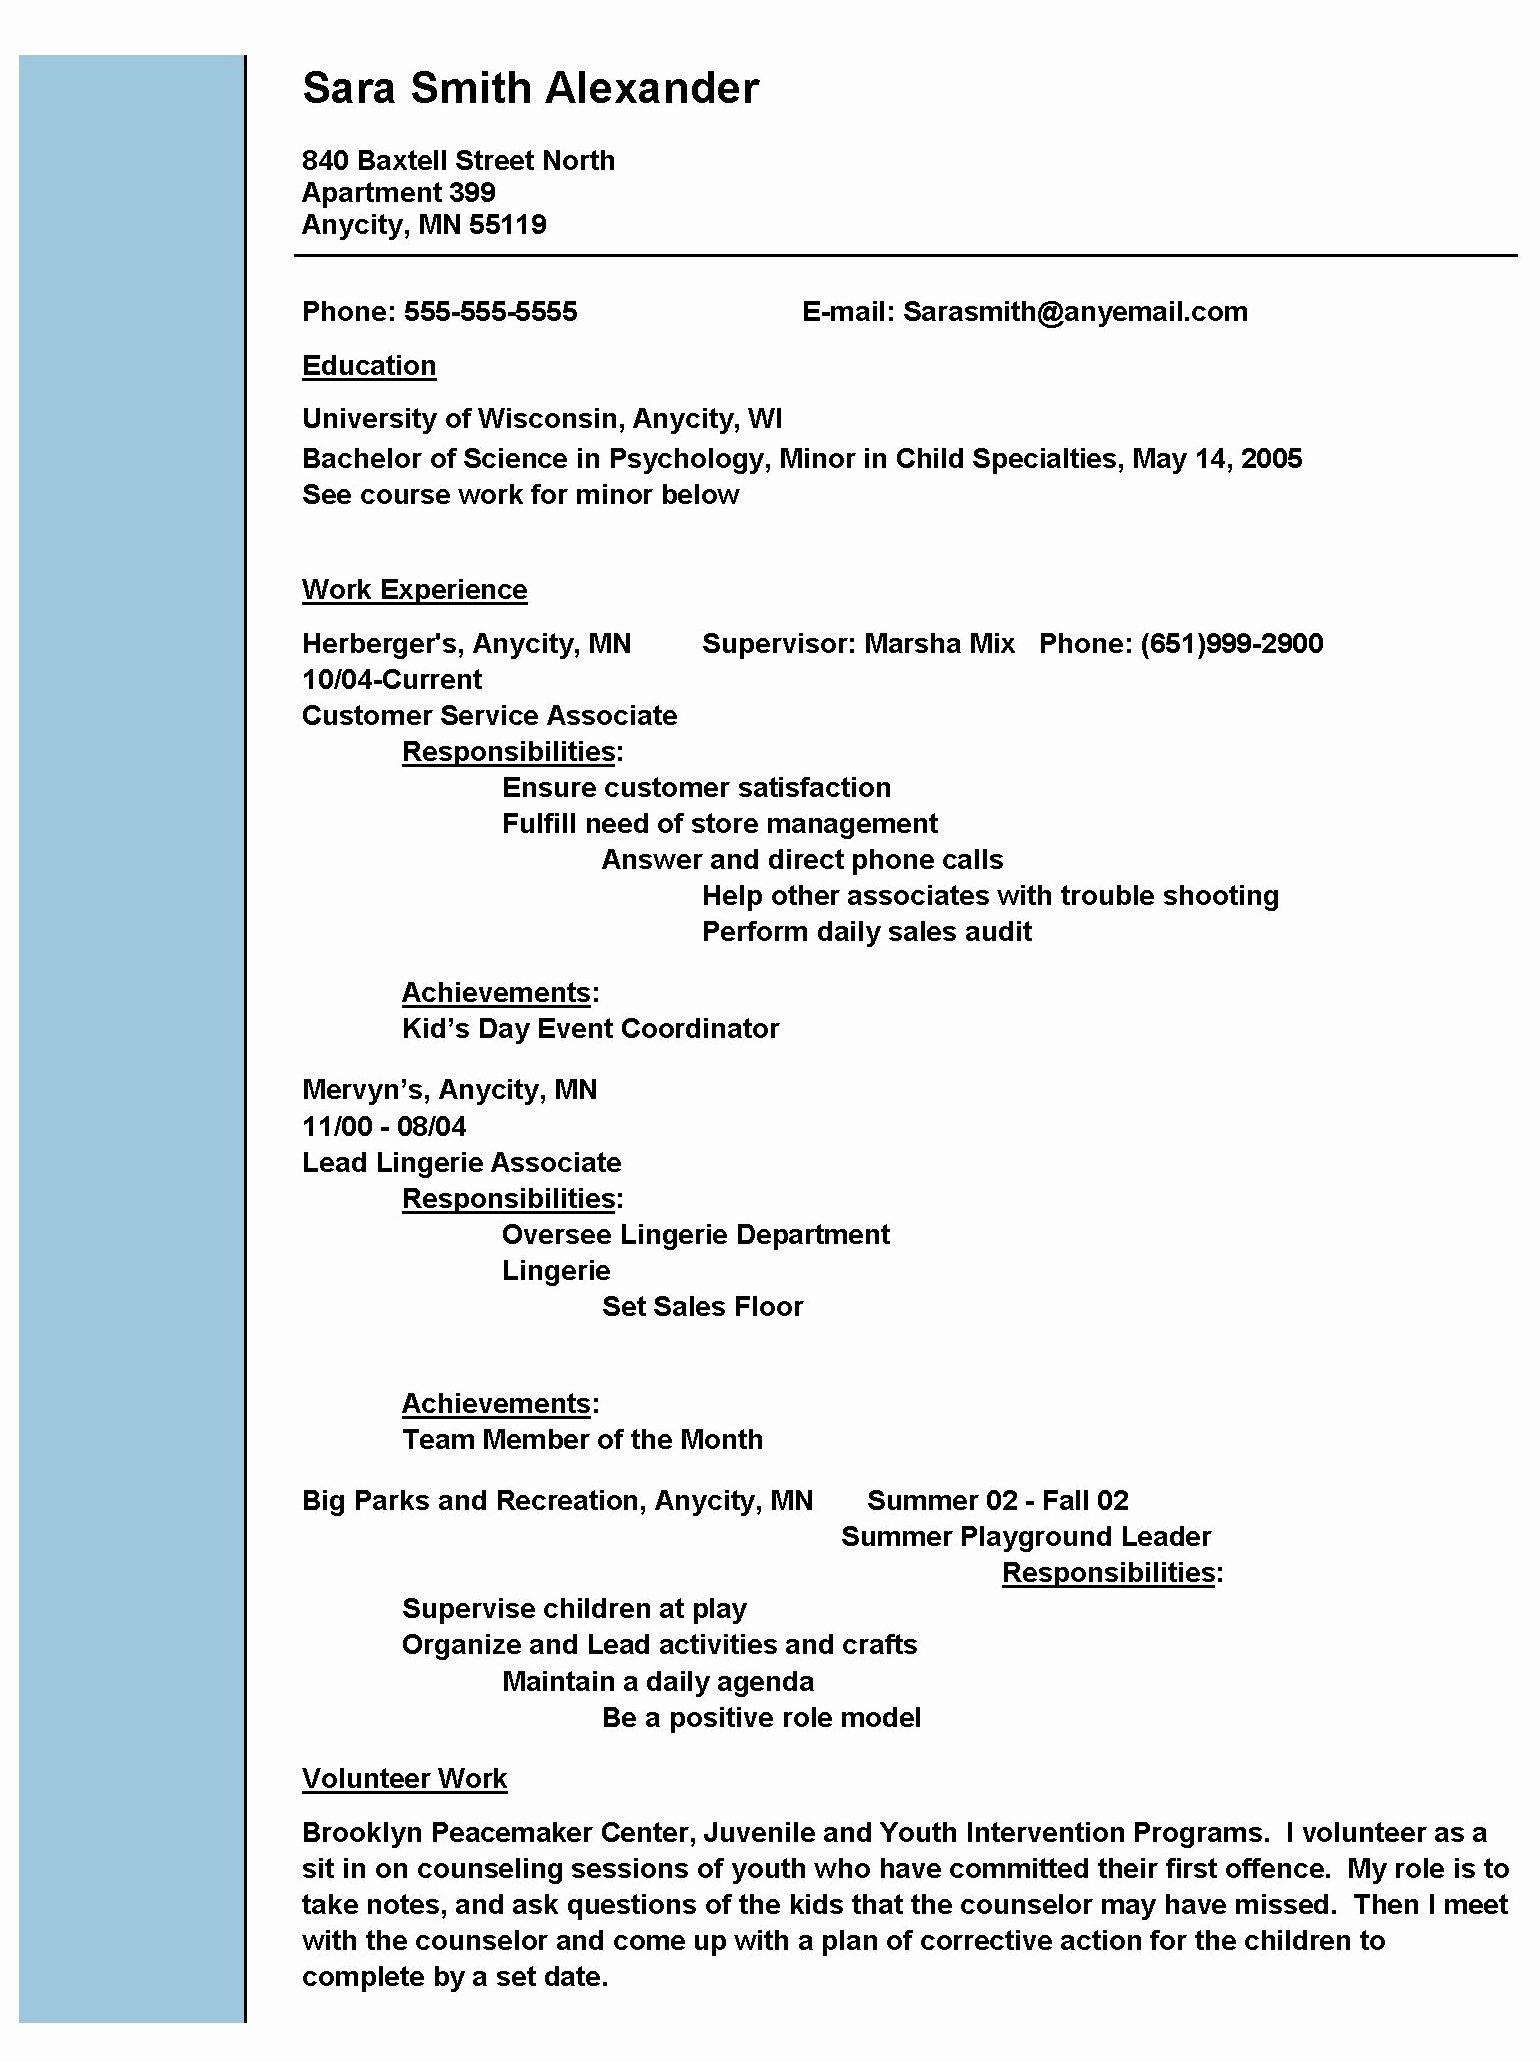 Social Work Resume Example Resume Templates